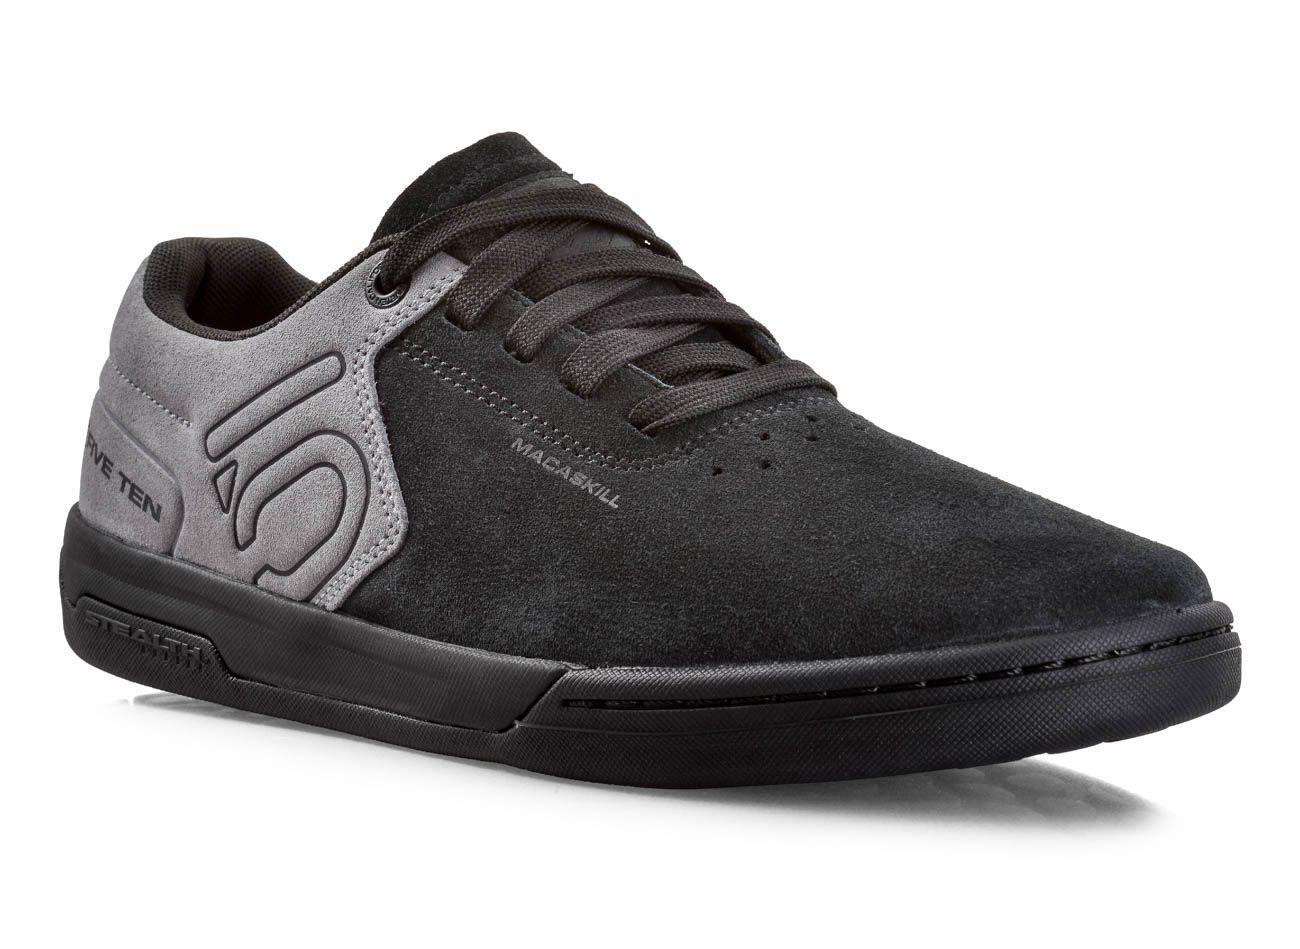 Five Ten   Danny MacAskill Men's BMX Shoe - Carbon Black